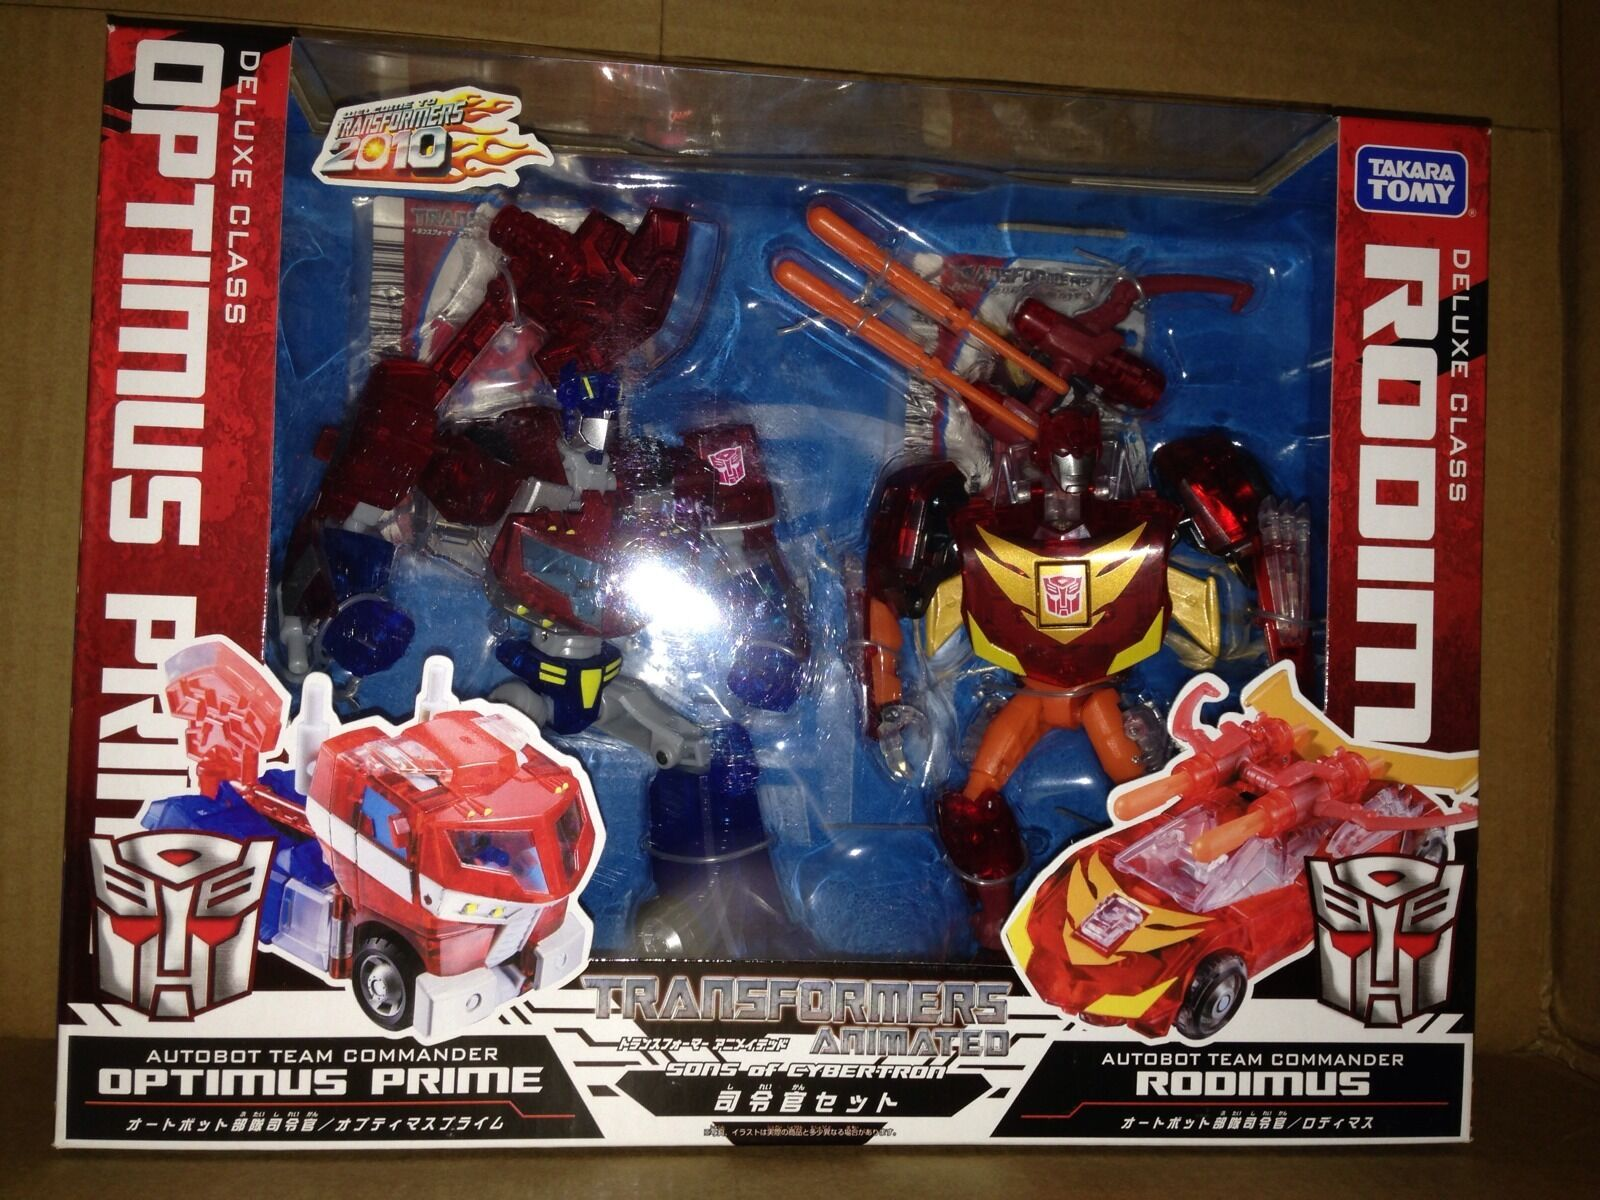 TAKARA TOMY Transformers Animated Optimus Prime & Rodimus Clear Japan Exclusive